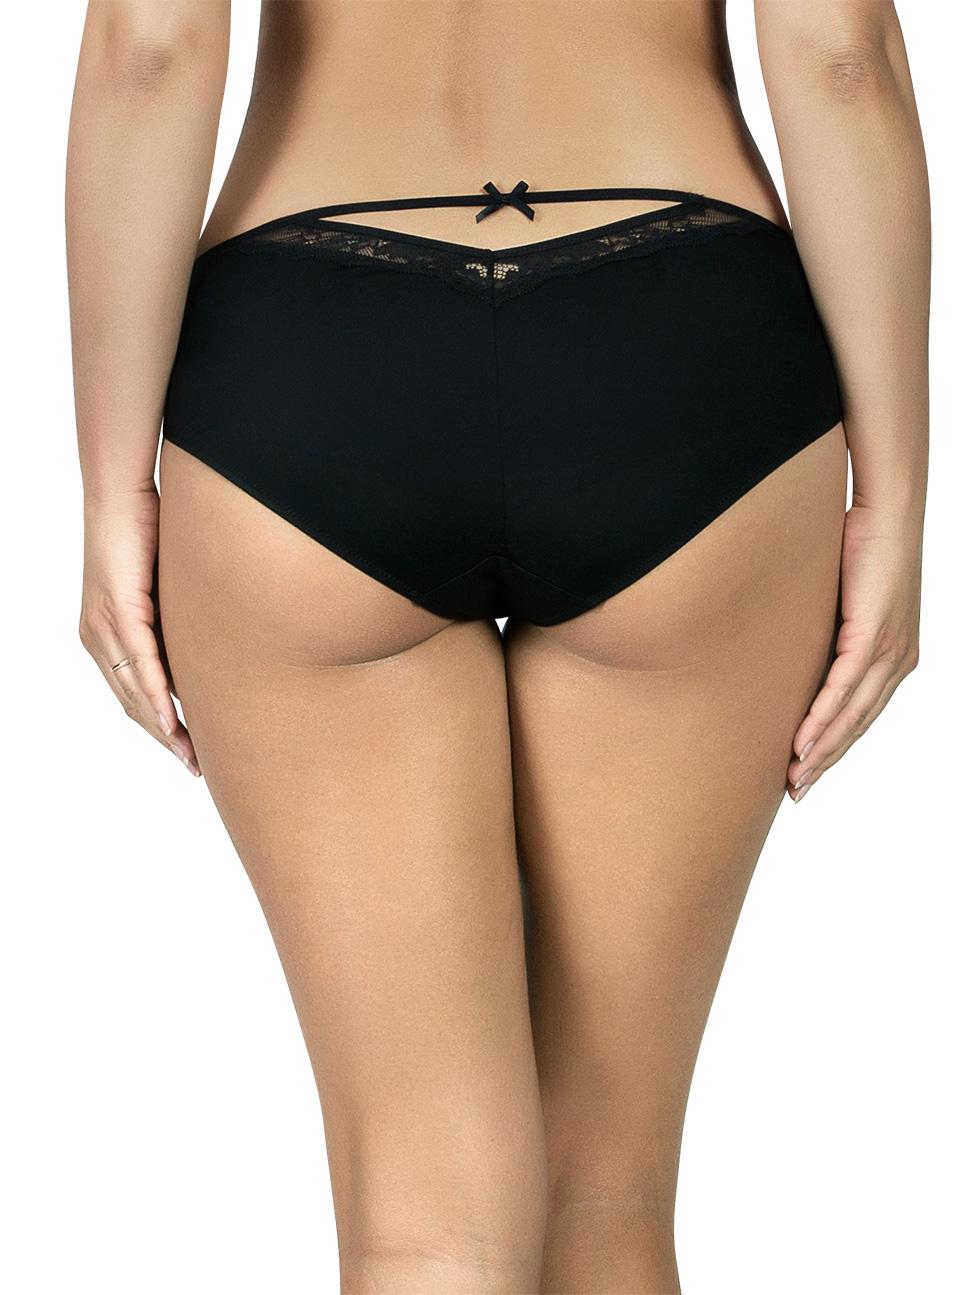 PARFAIT Aubrey Bikini P5763 Black Back - Aubrey Bikini Black P5763